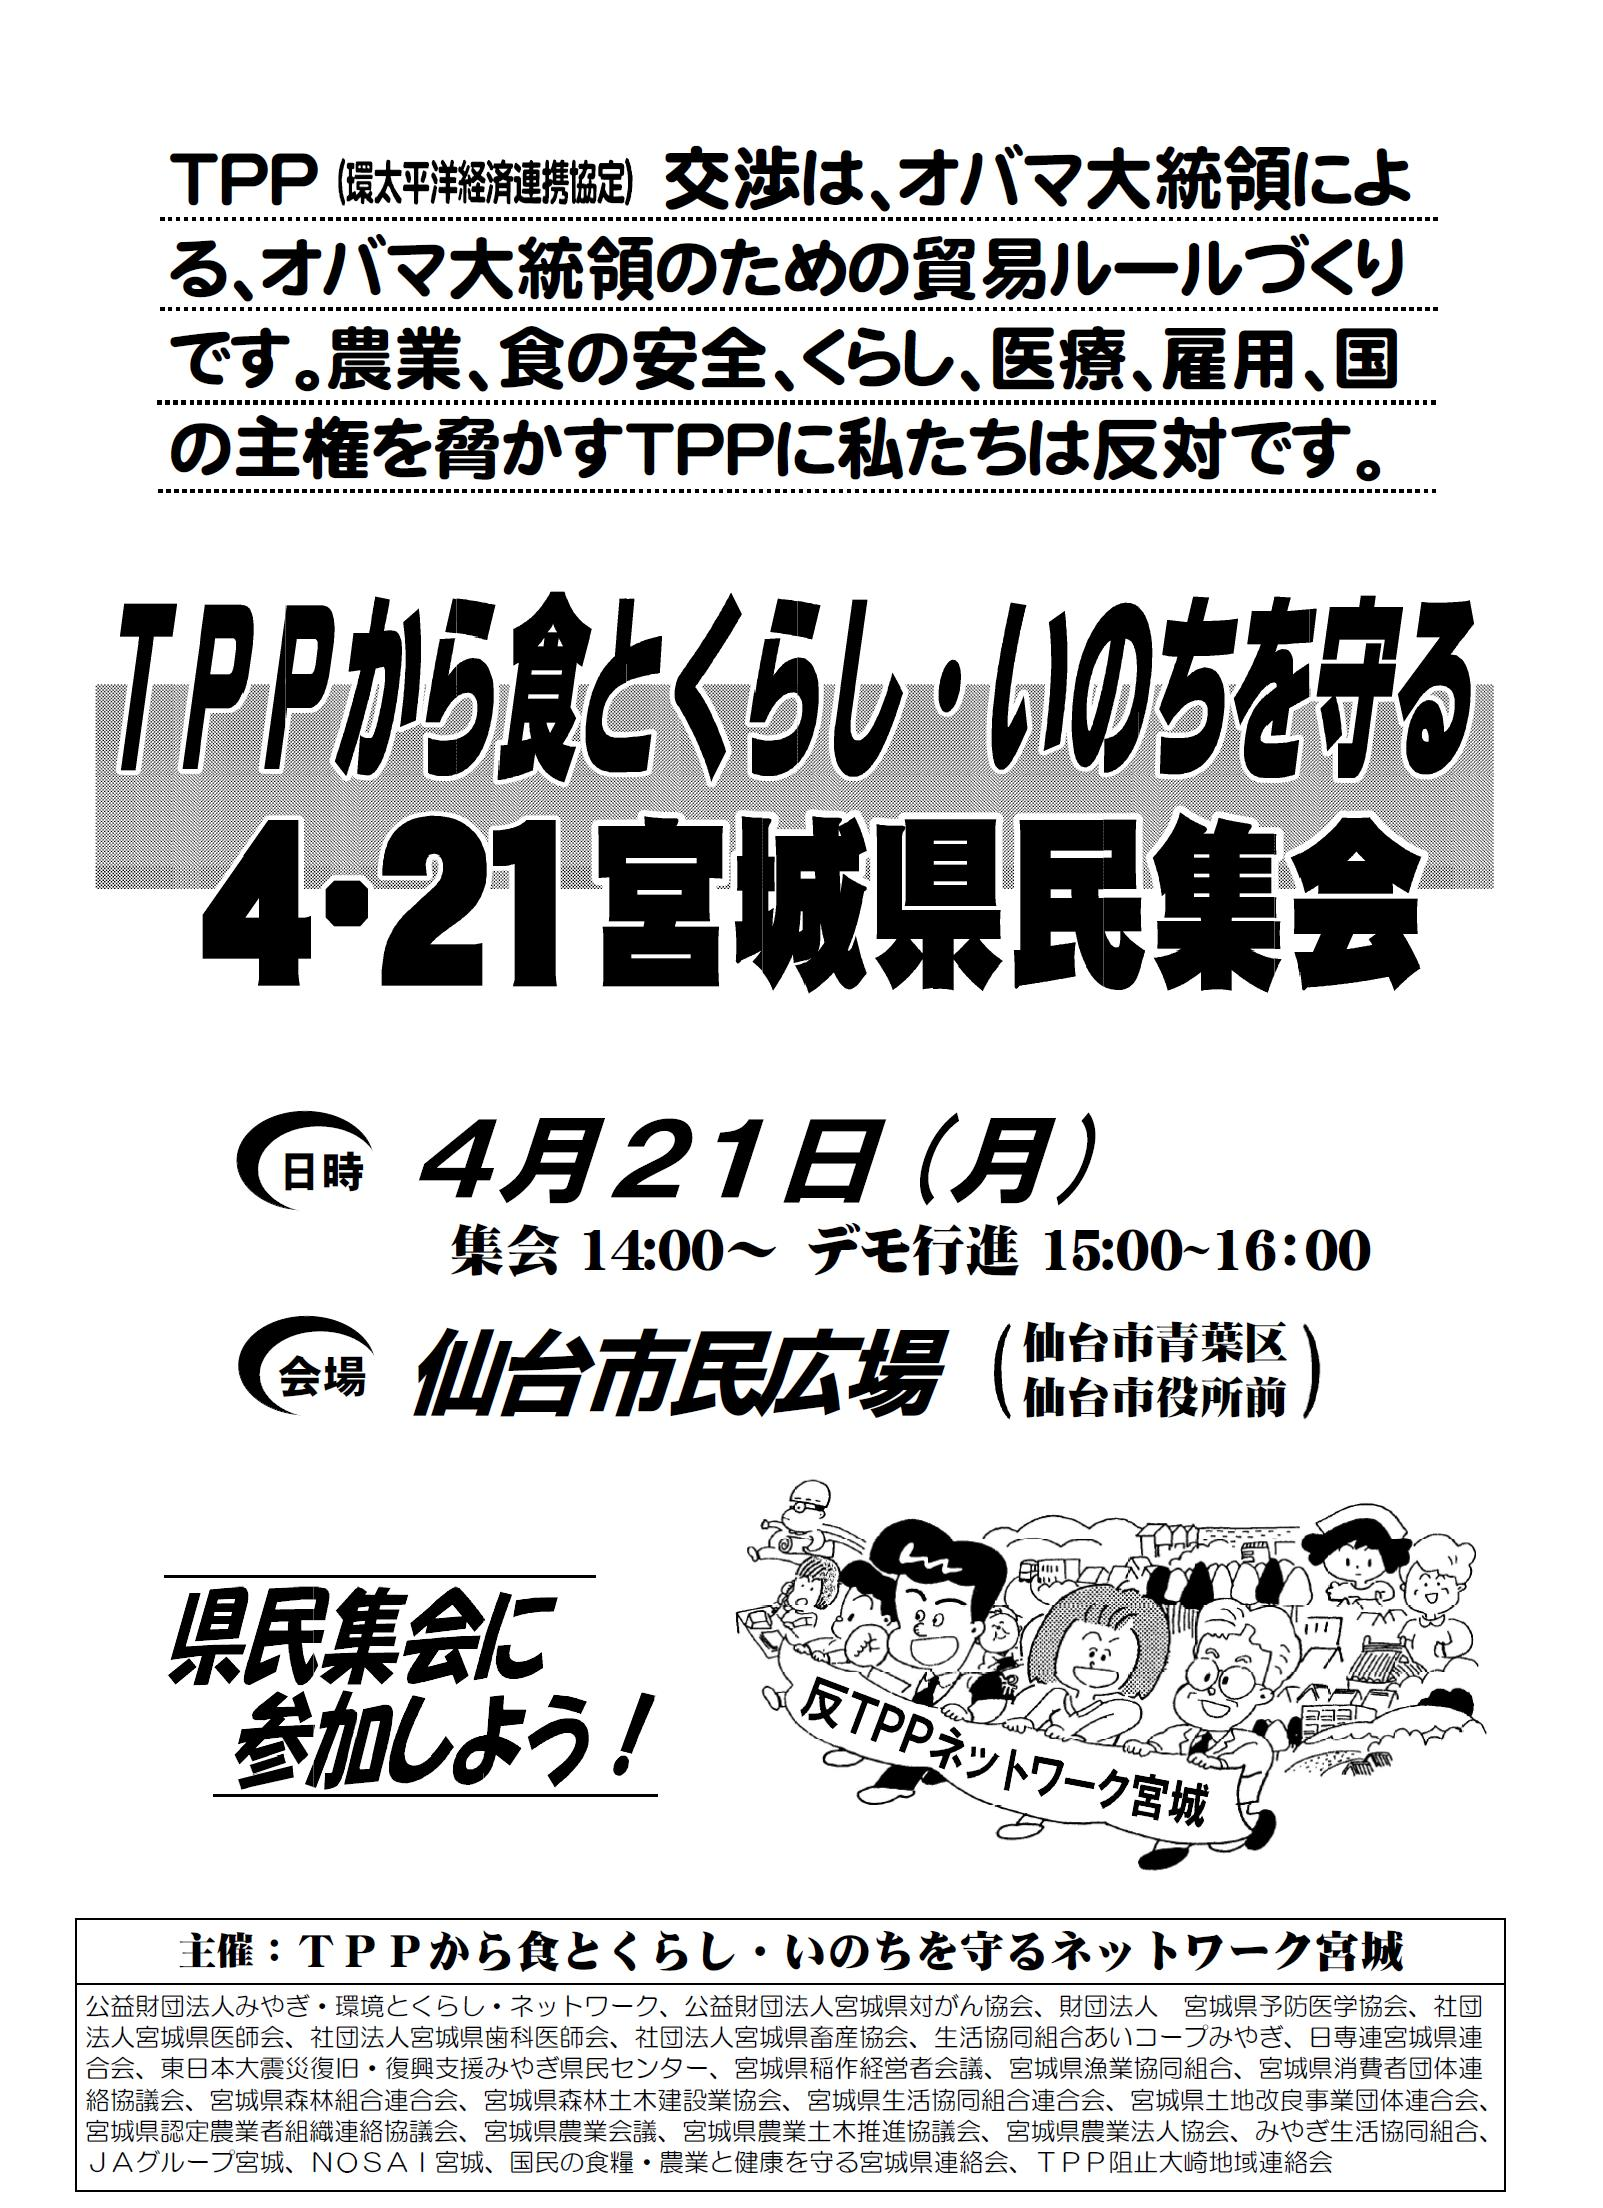 TPP 421